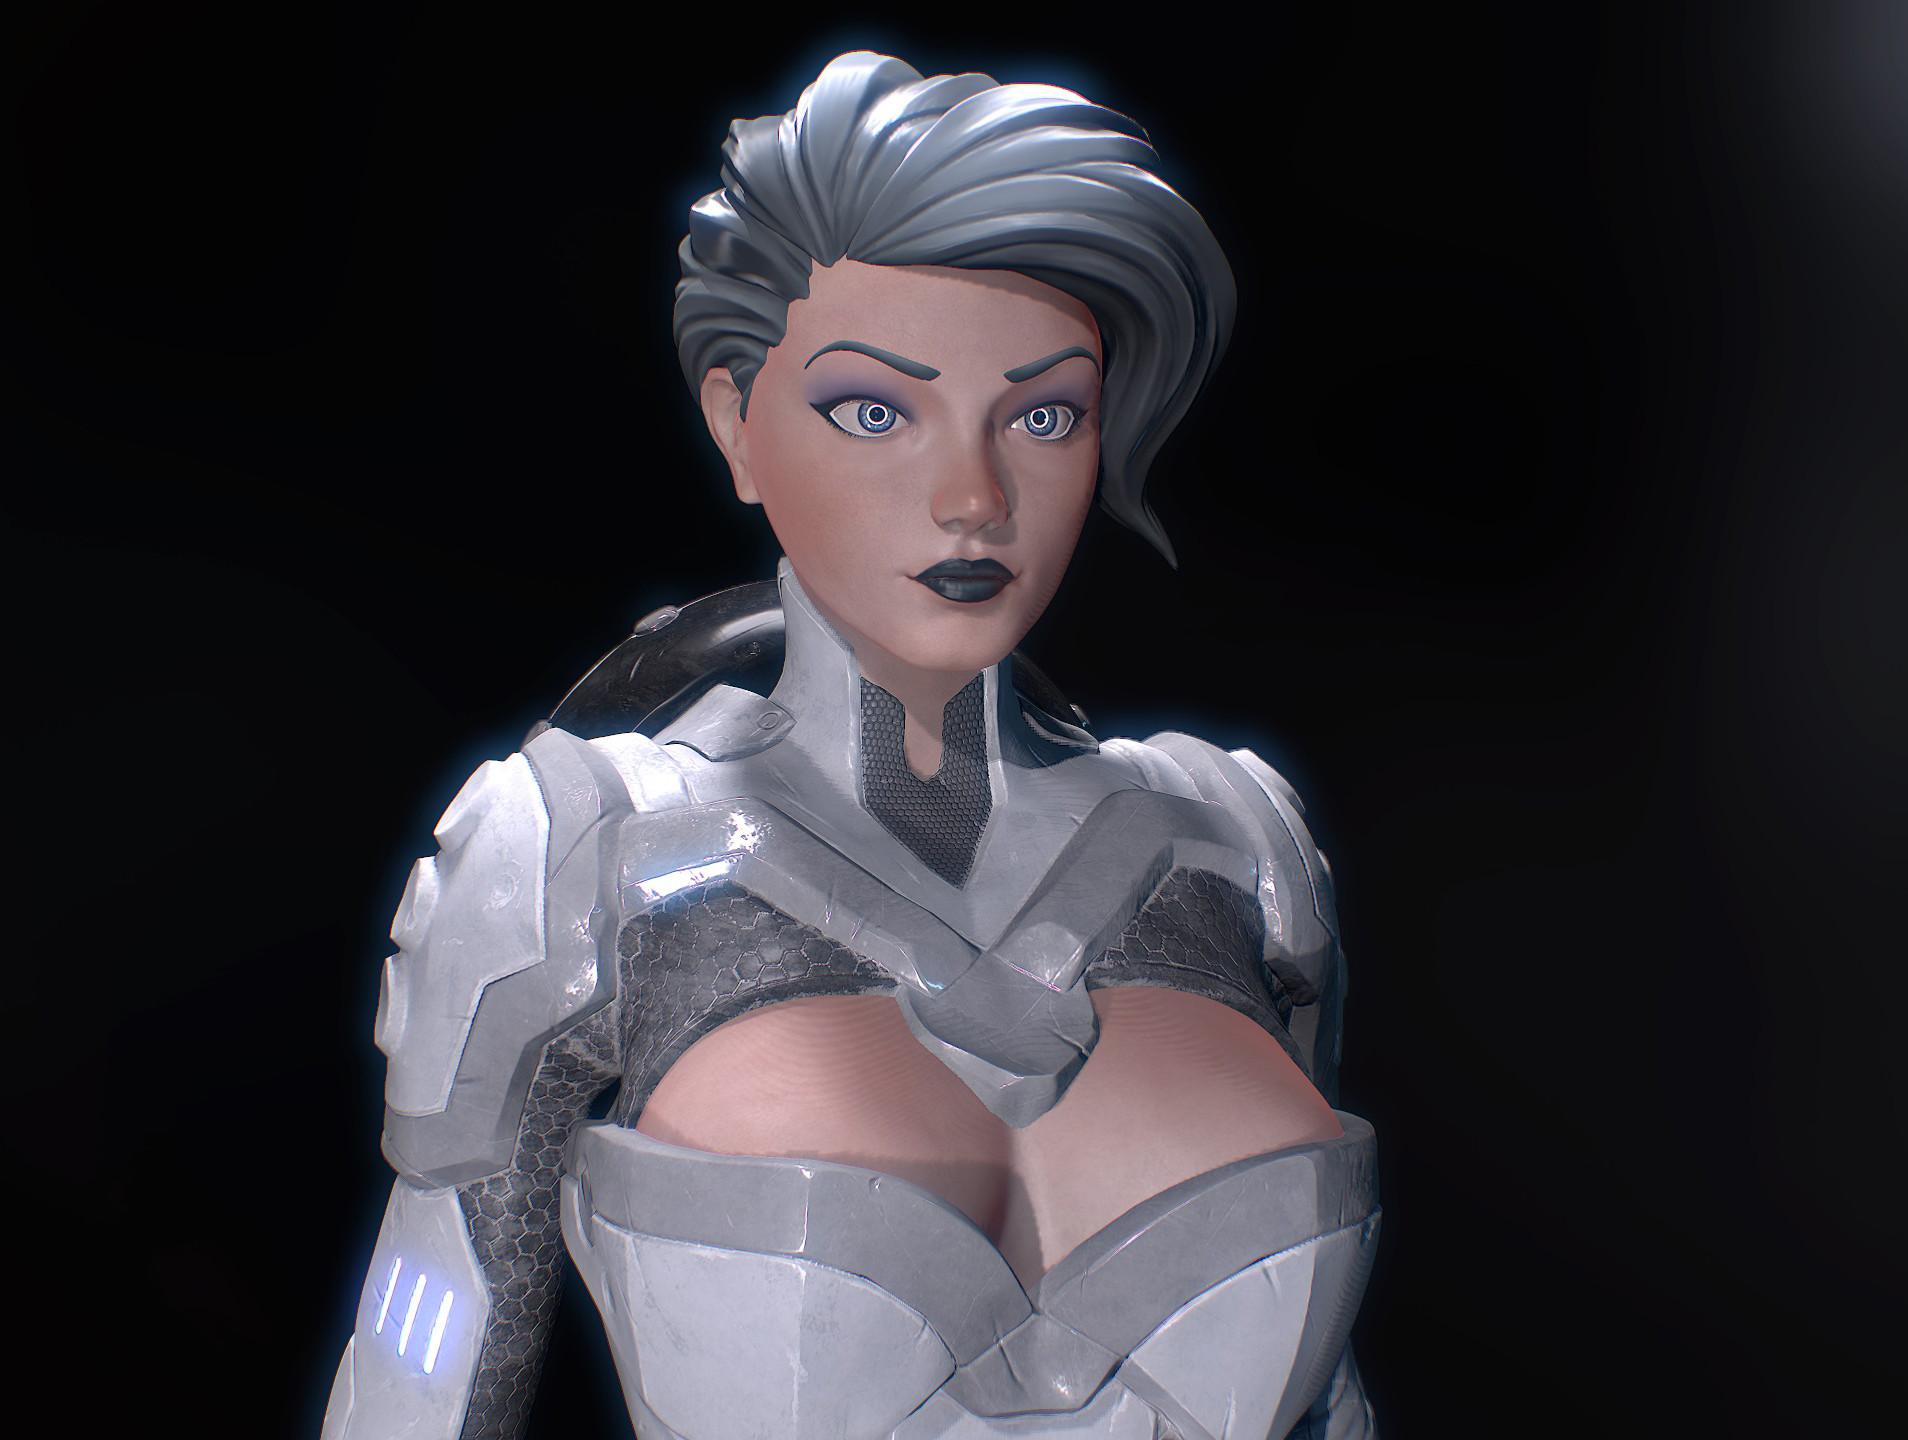 Eren ozel cinder scifi costume design 31 161206